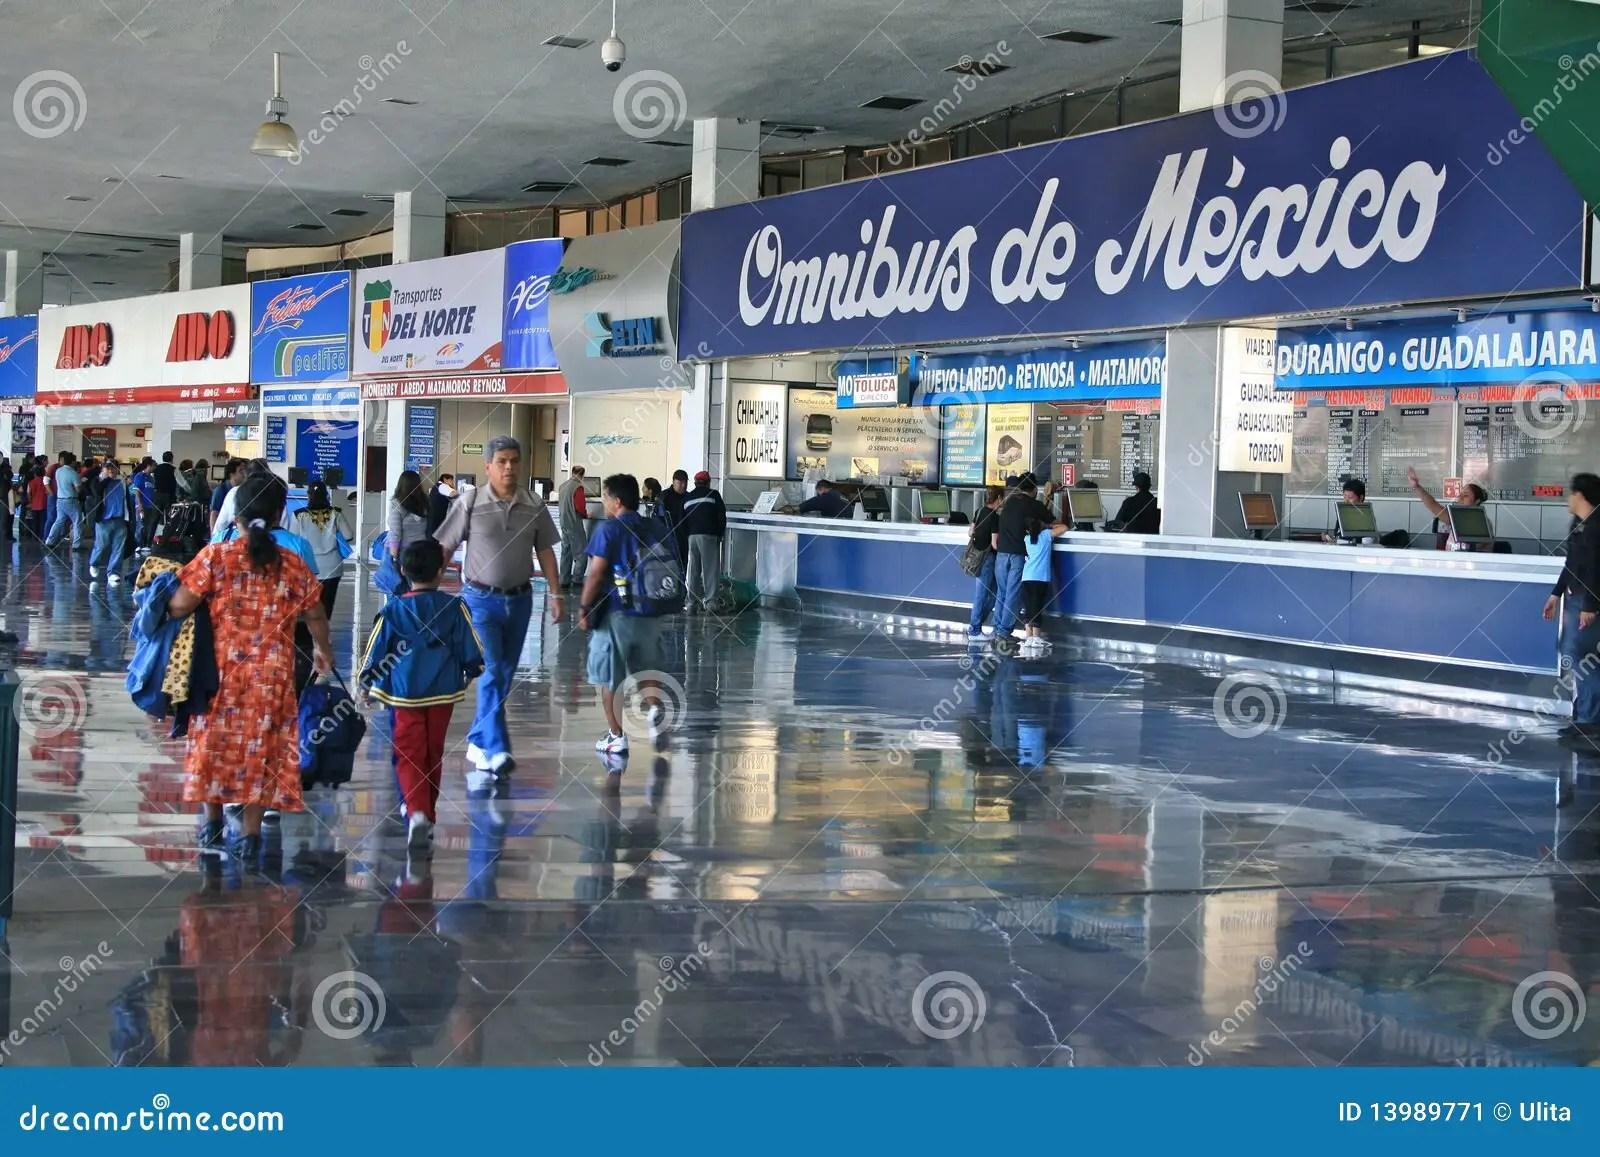 Terminal Central Del Norte Mexico City Editorial Photo